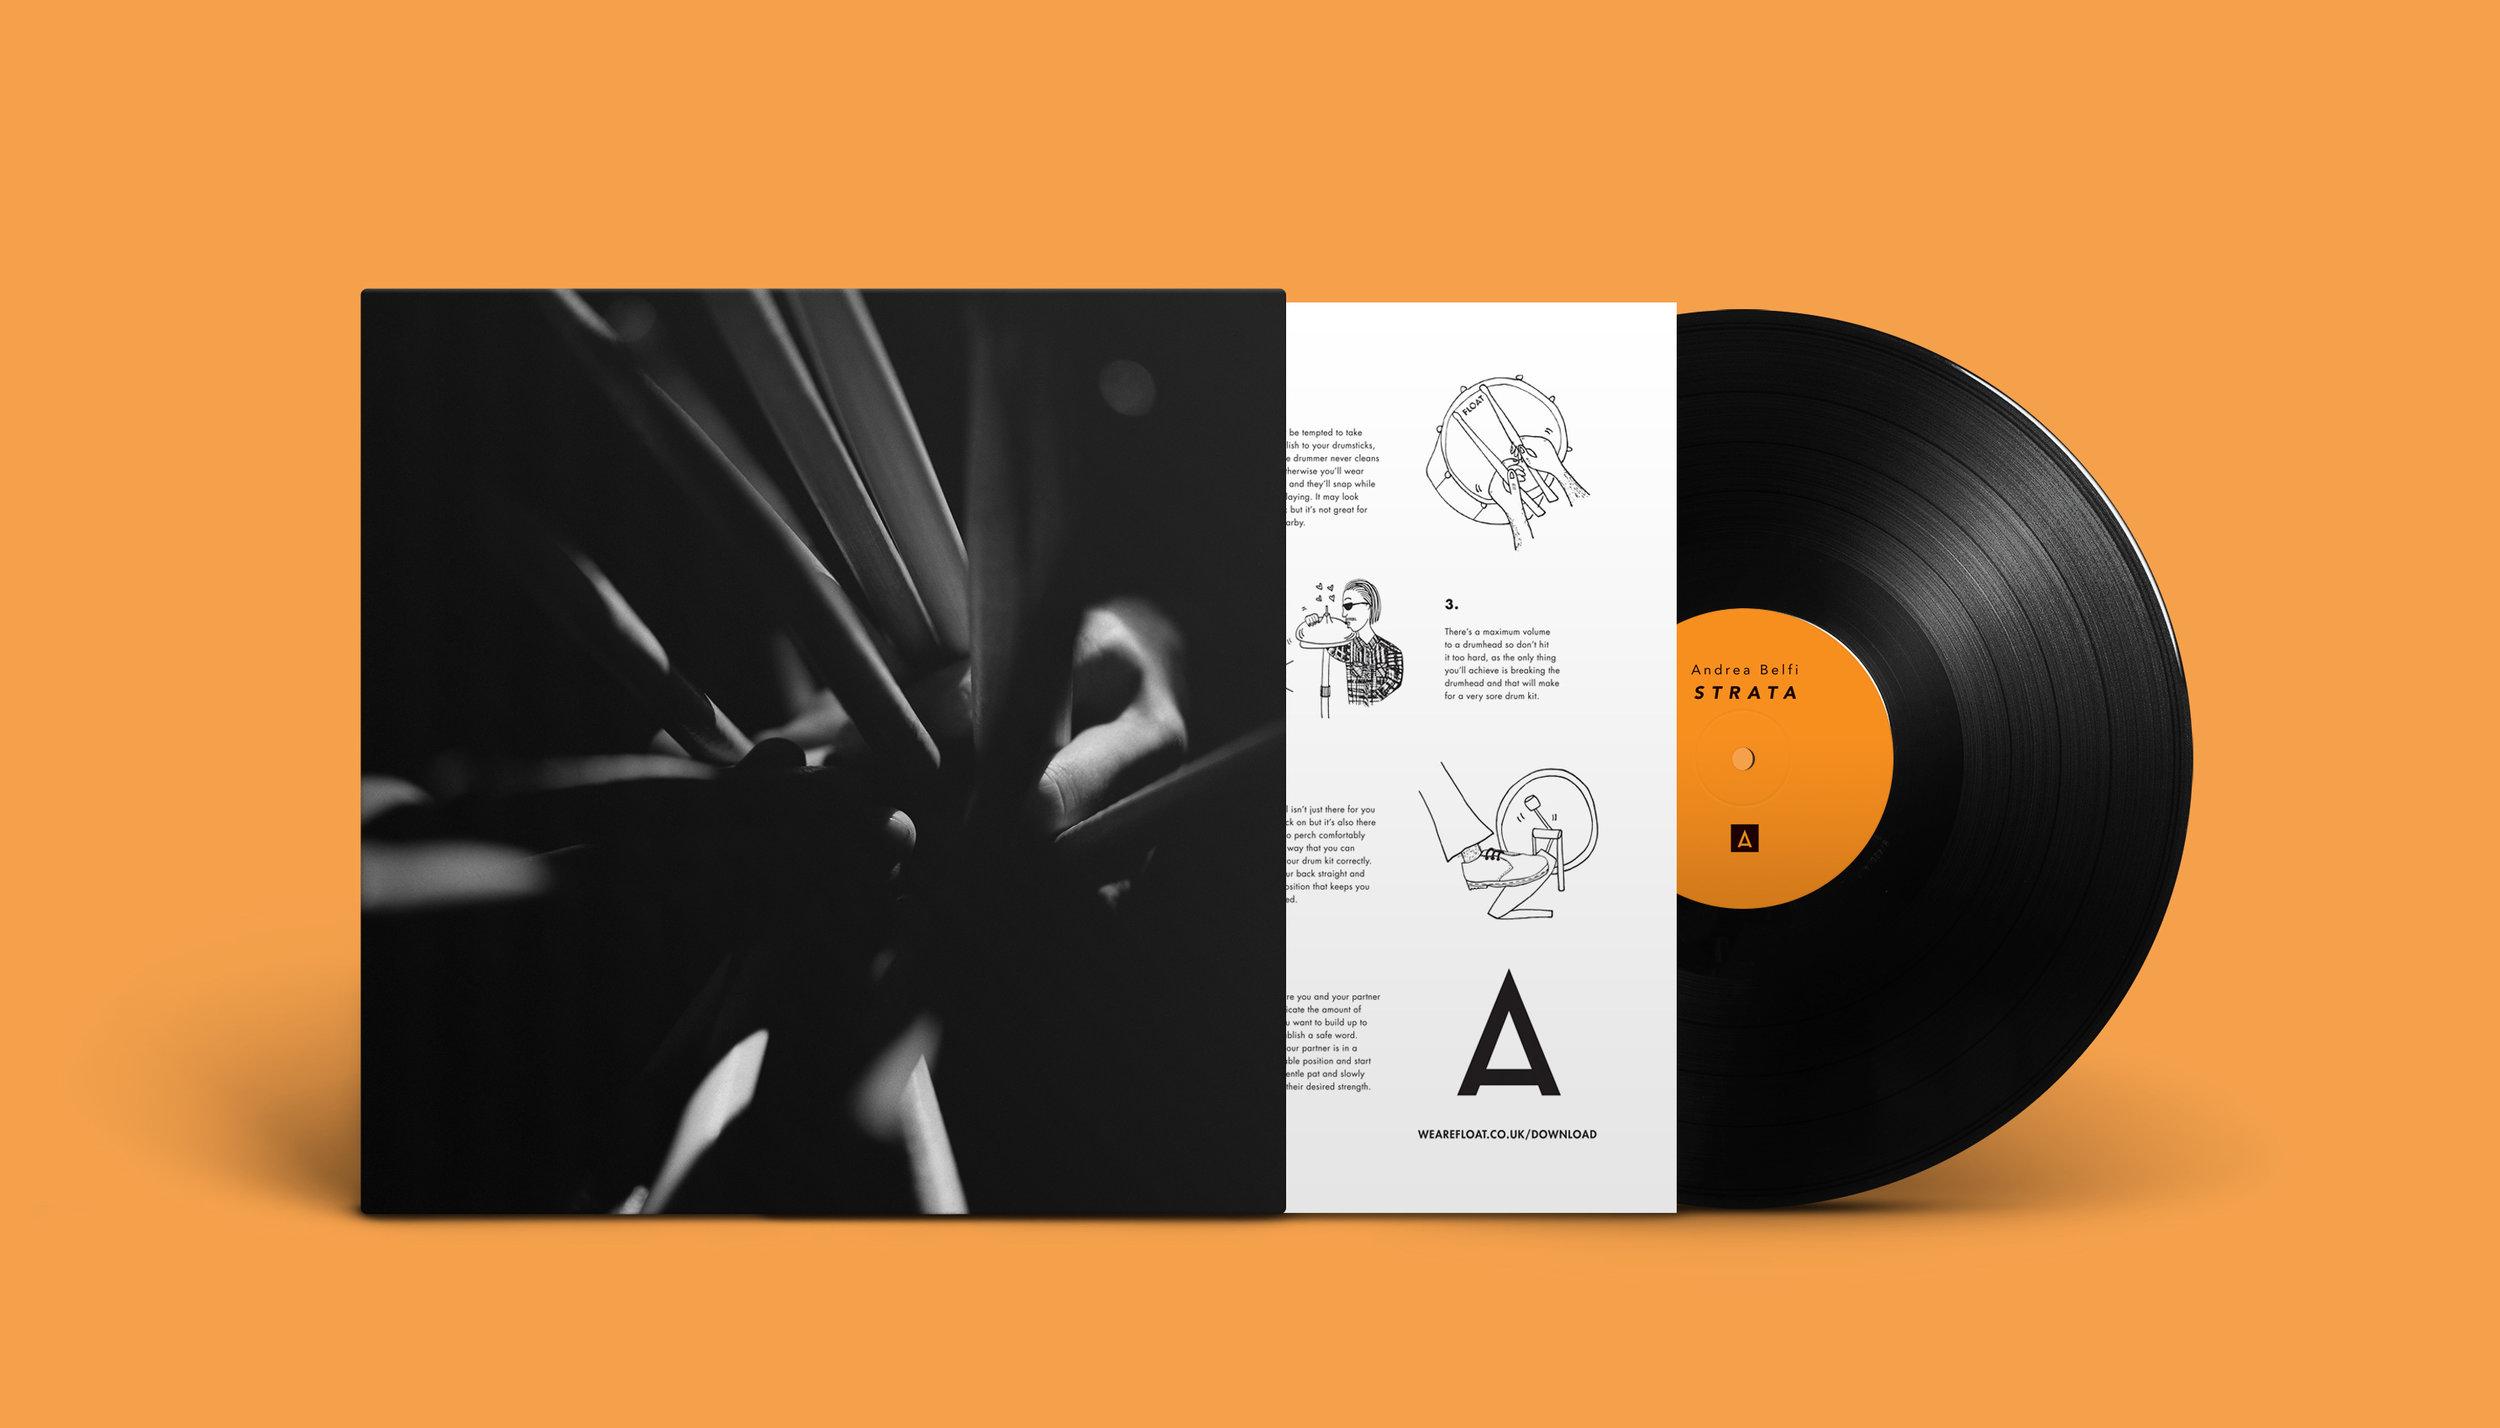 Andrea-Belfi_STRATA_vinyl-mock-up_with guide.jpg